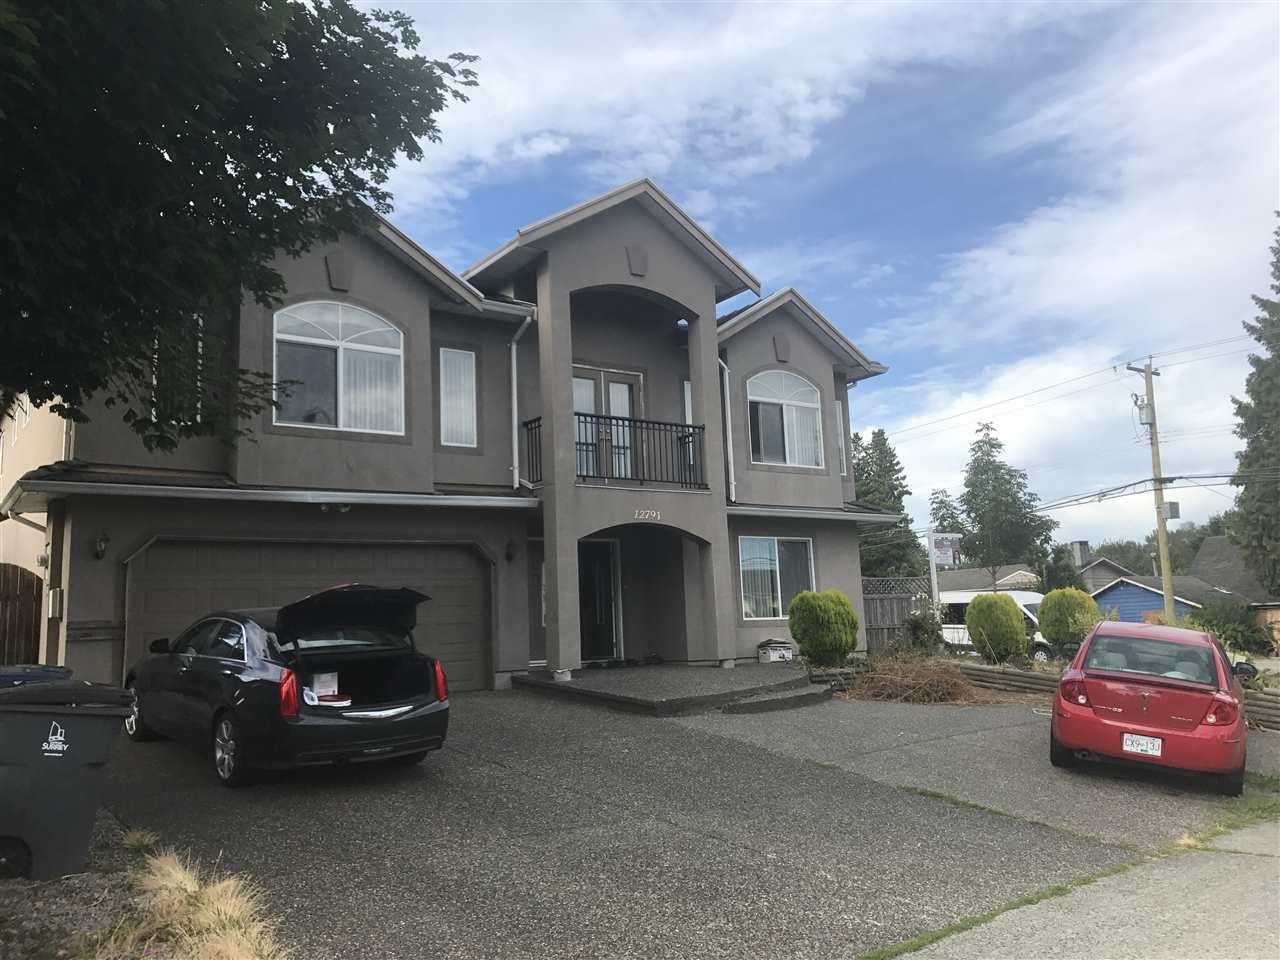 Detached at 12791 90TH AVENUE, Surrey, British Columbia. Image 1